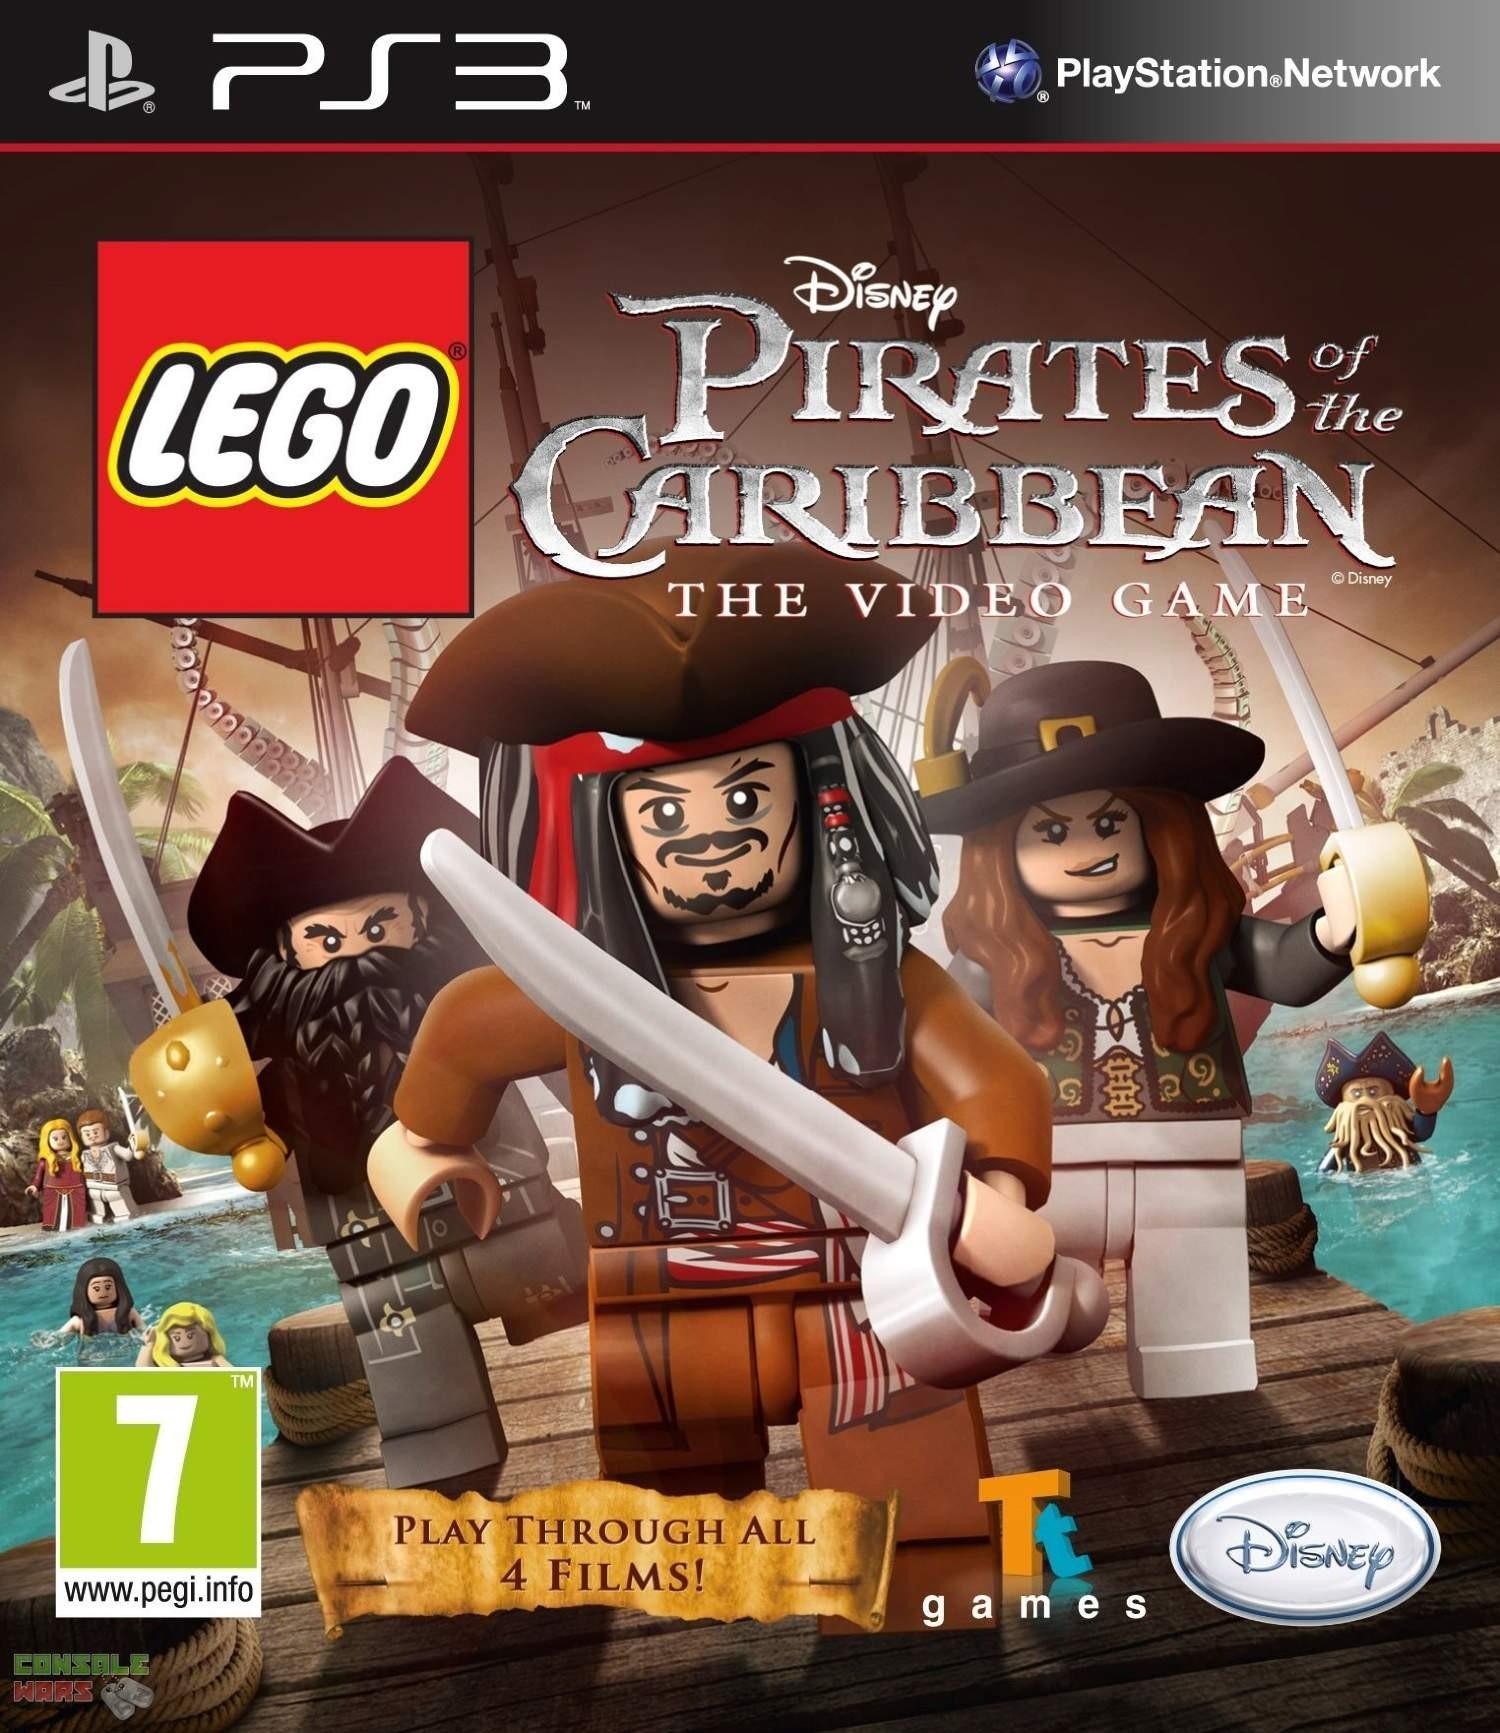 LEGO Pirates of the Caribbean The Video Game | LEGO Пірати Карибського Моря б/в PS3